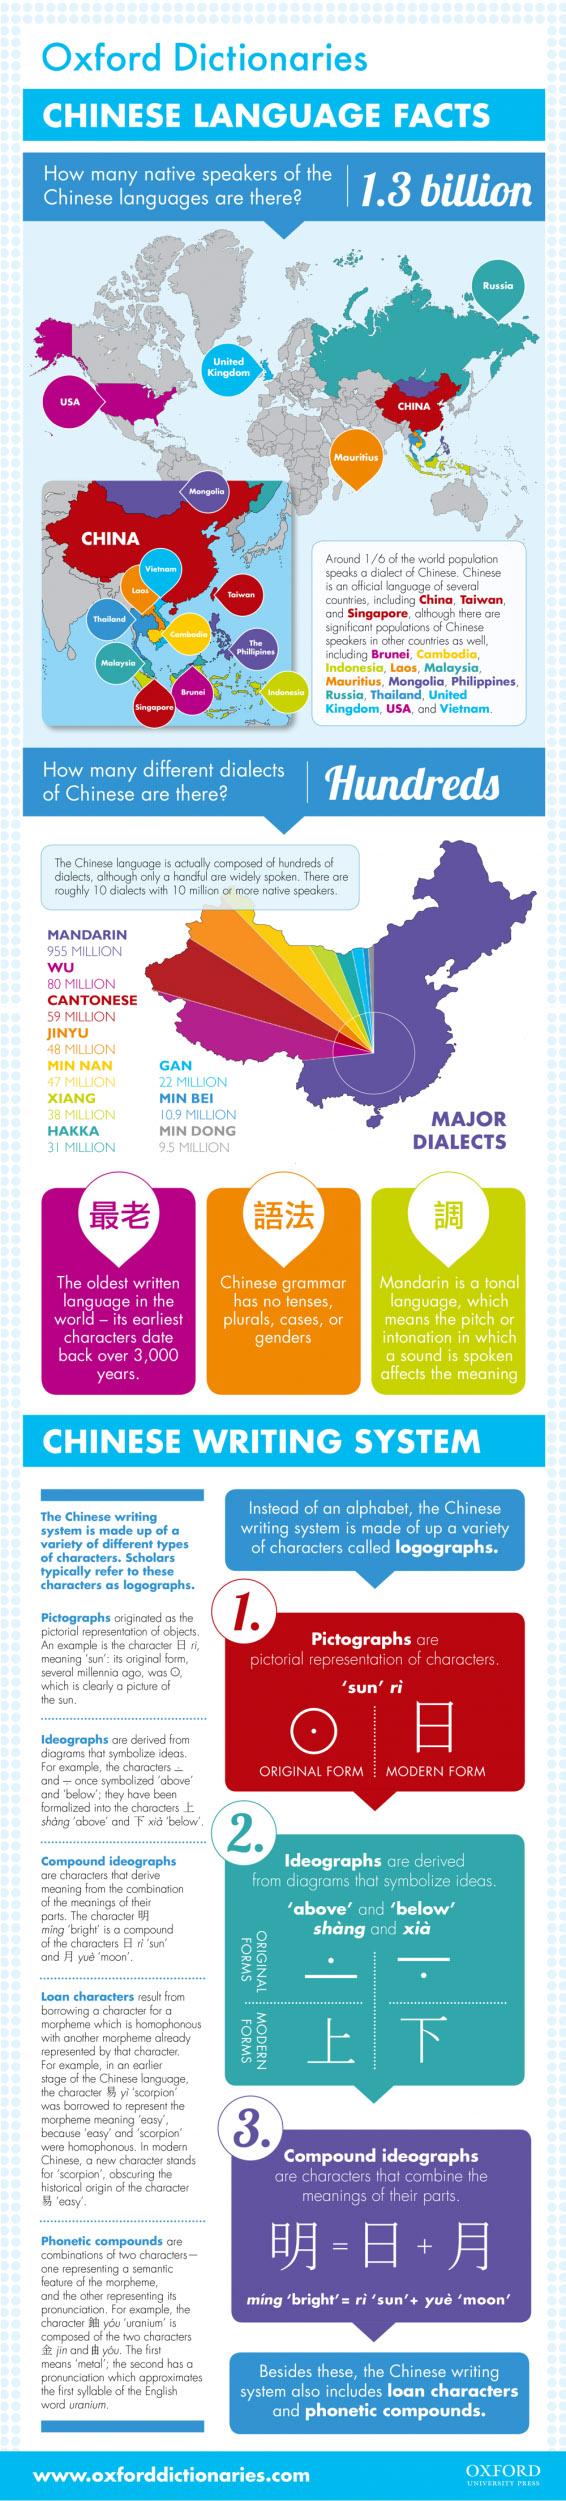 Chinese-Language-Infographic-566x2501 copy